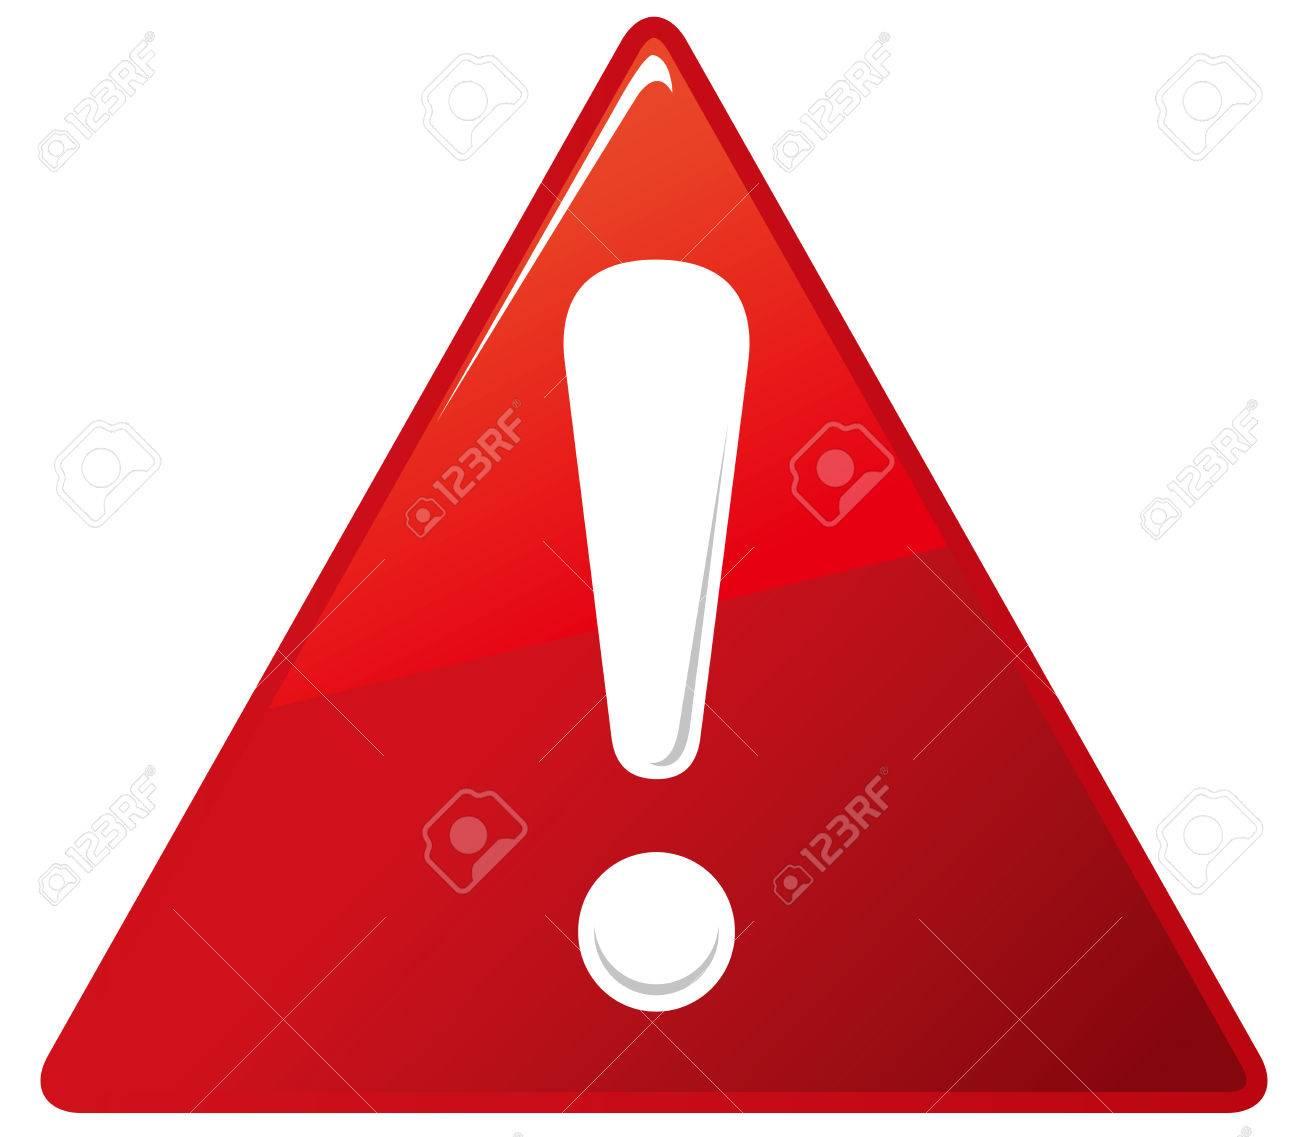 warning sign Vector - 46283734